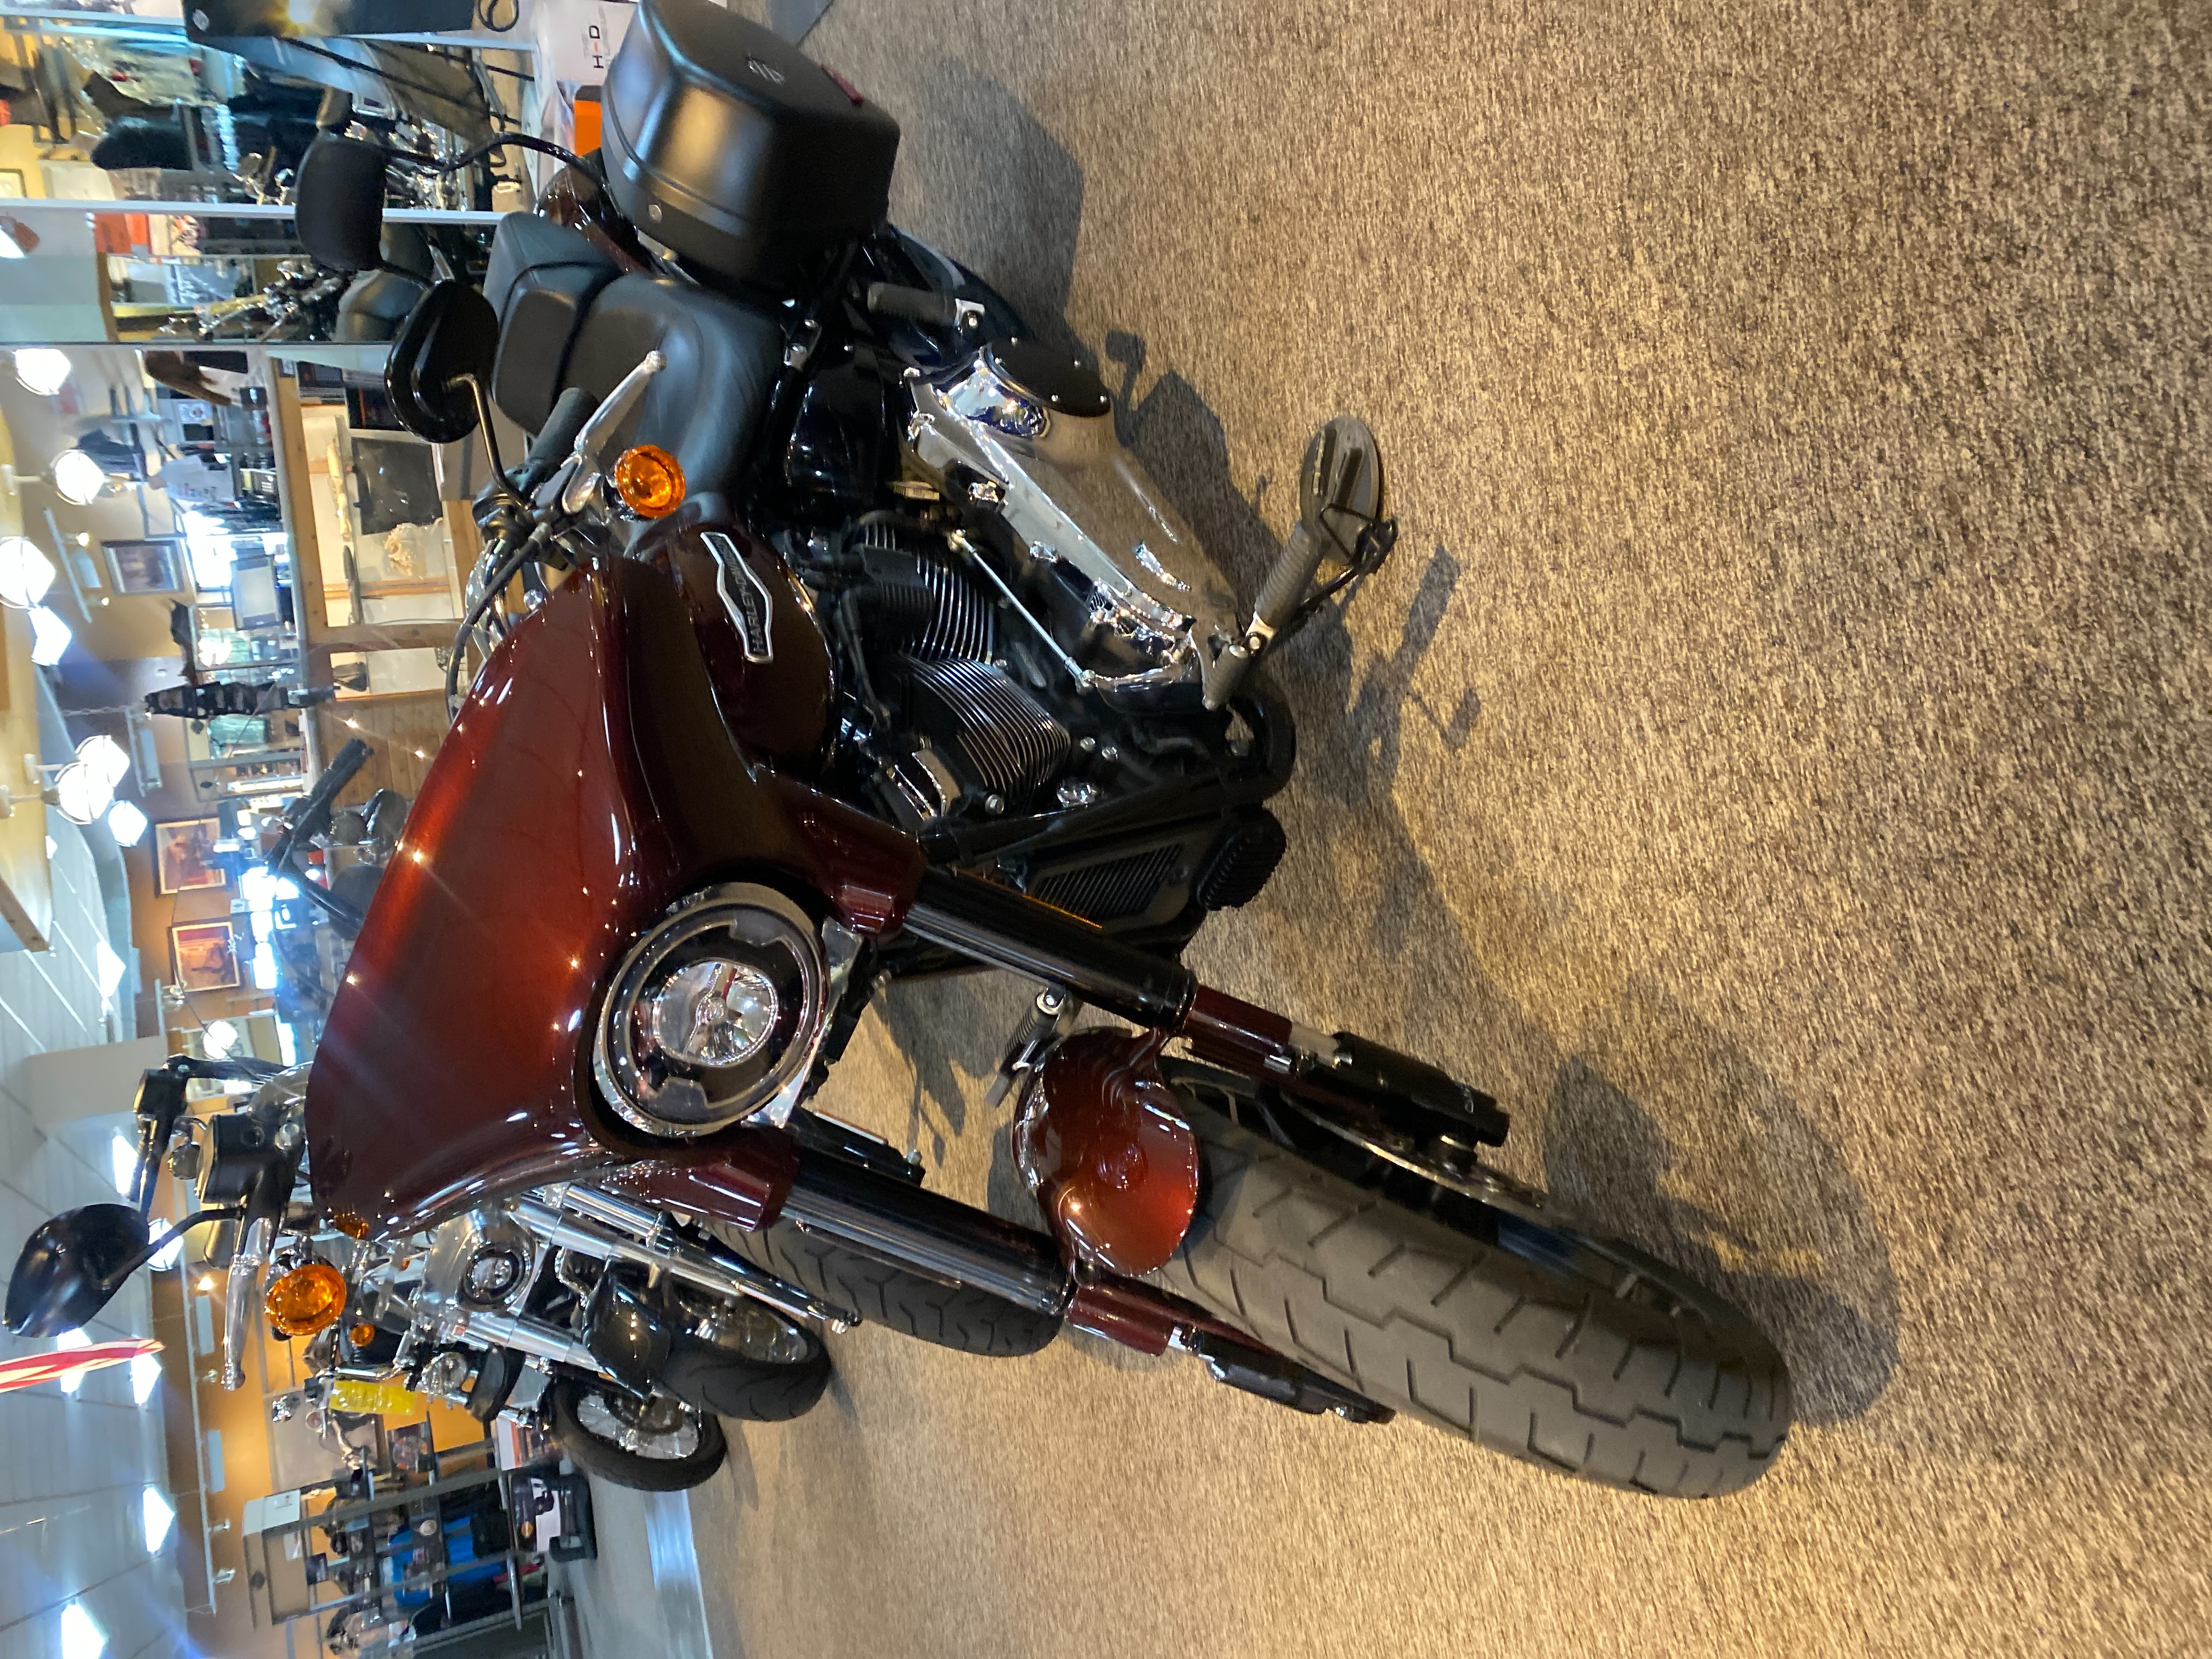 2018 Harley-Davidson Softail Sport Glide at Outpost Harley-Davidson